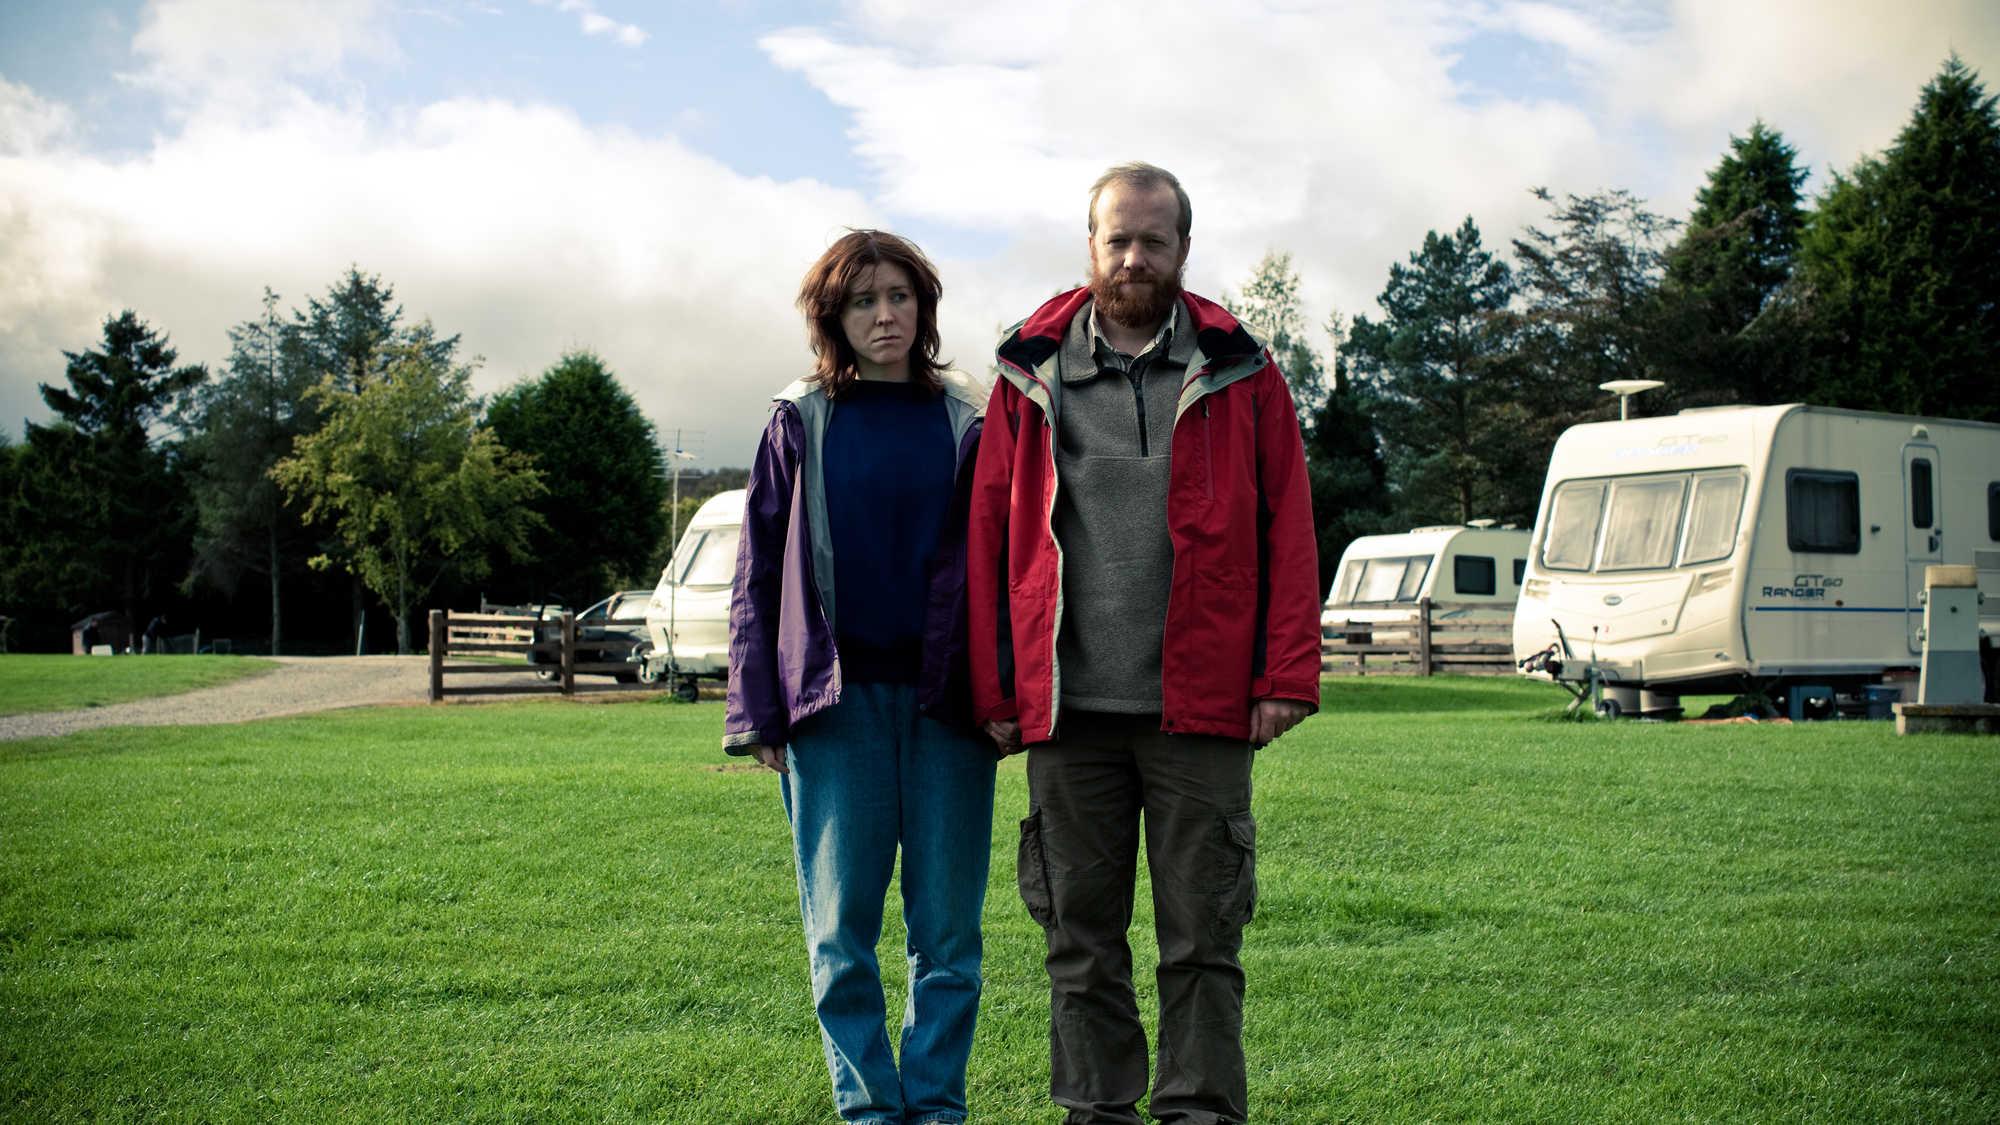 1. SIGHTSEERS by Ben Wheatley. Alice Lowe (tina) and Steve Oram (chris)_MG_3659-2000-2000-1125-1125-crop-fill.jpg